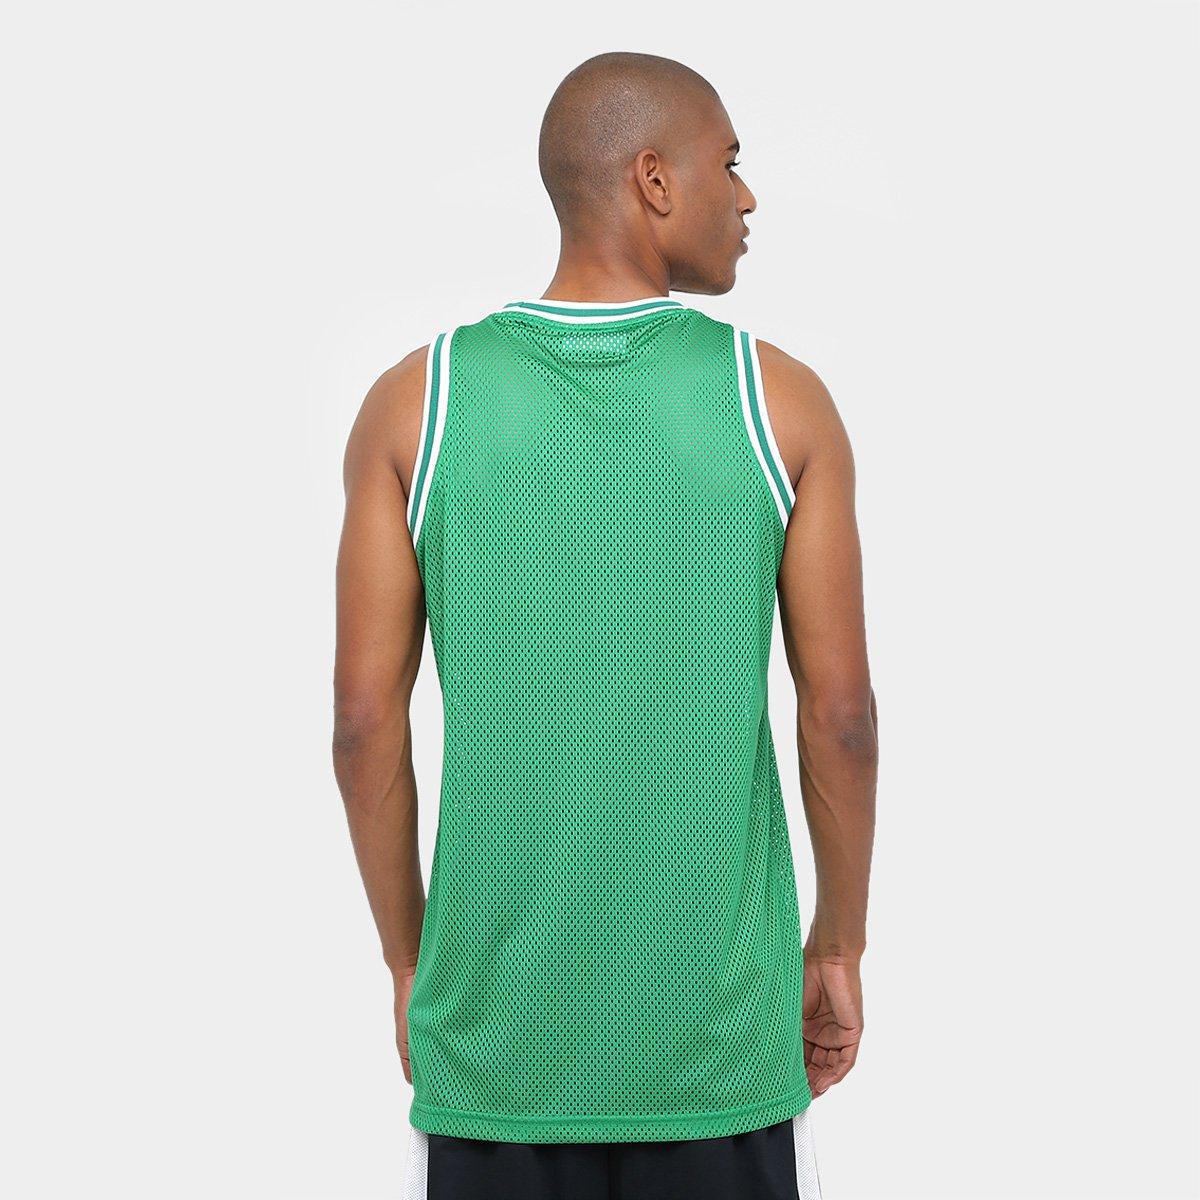 ... Camiseta Regata NBA Boston Celtics New Era Jersey Game Masculina ... d36a373f462